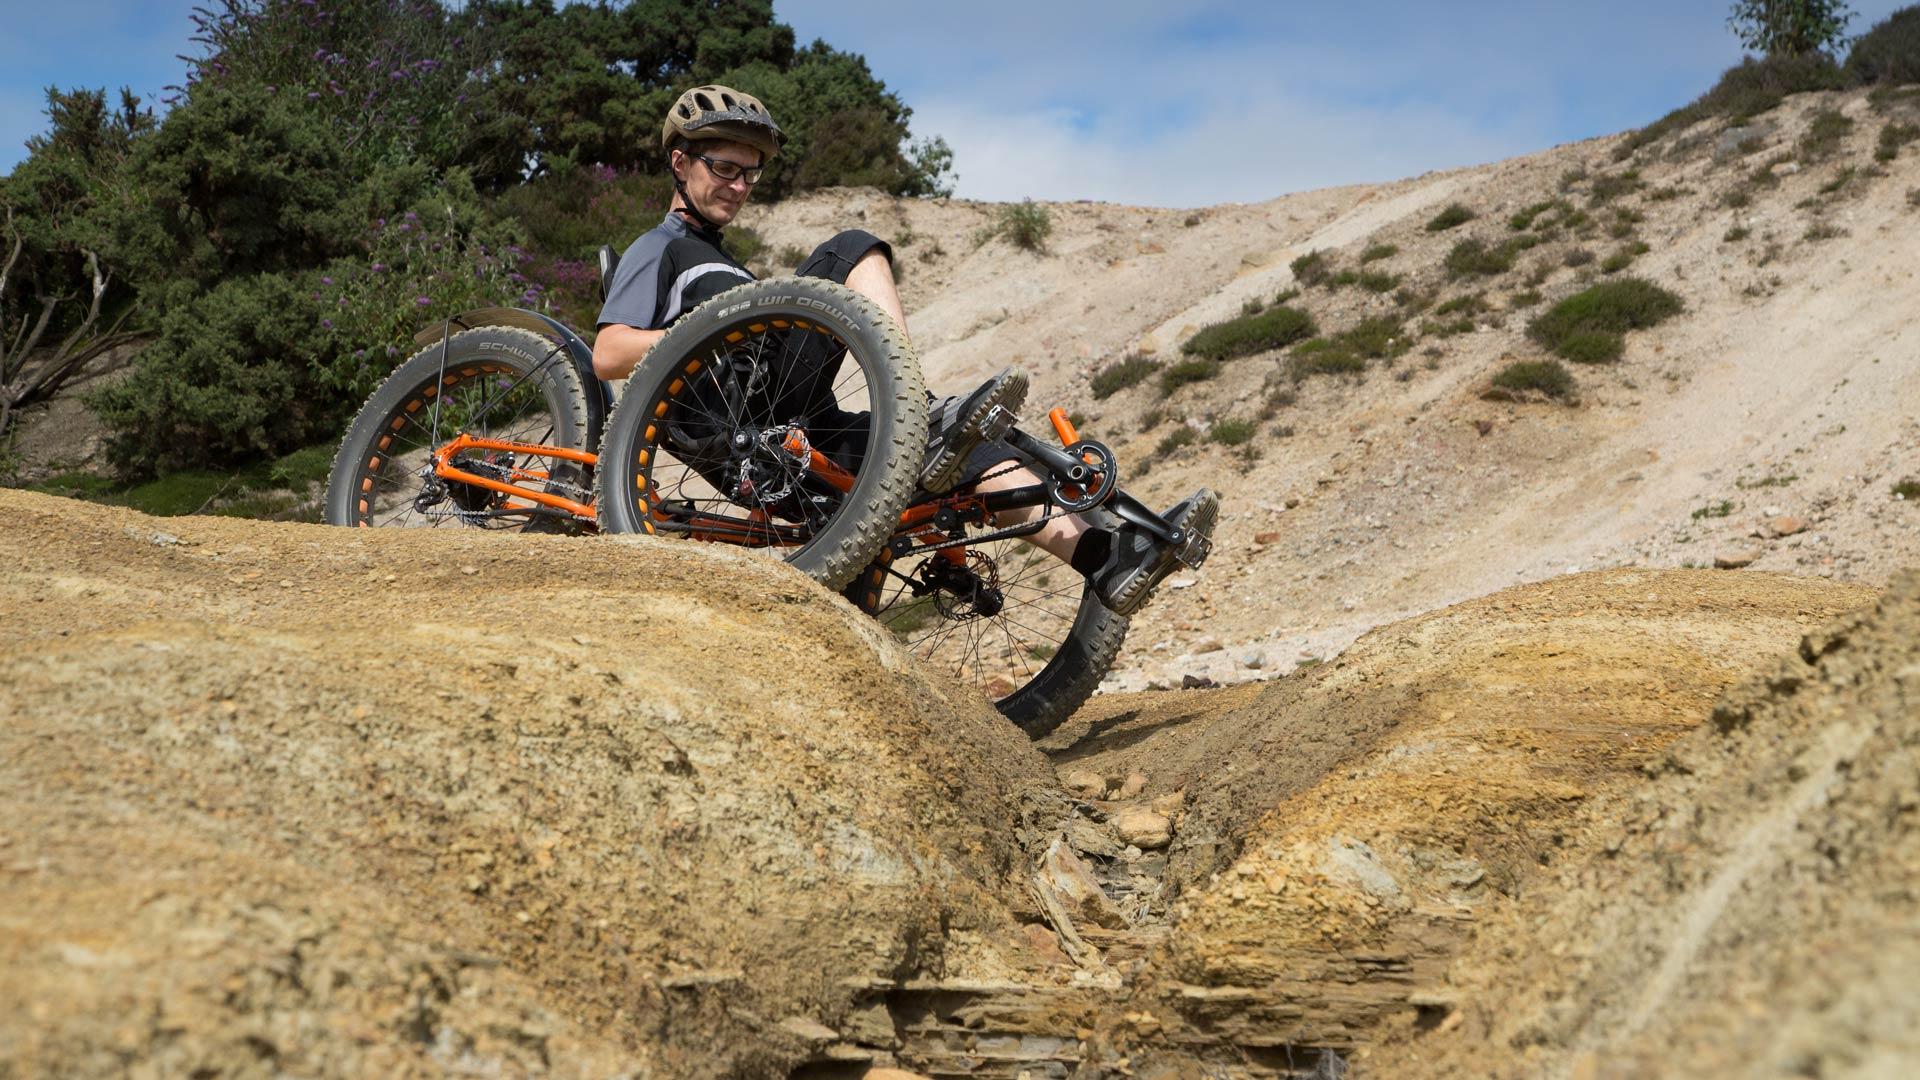 Ice Full Fat Off Road Expedition Tough Recumbent Folding Trike Bike